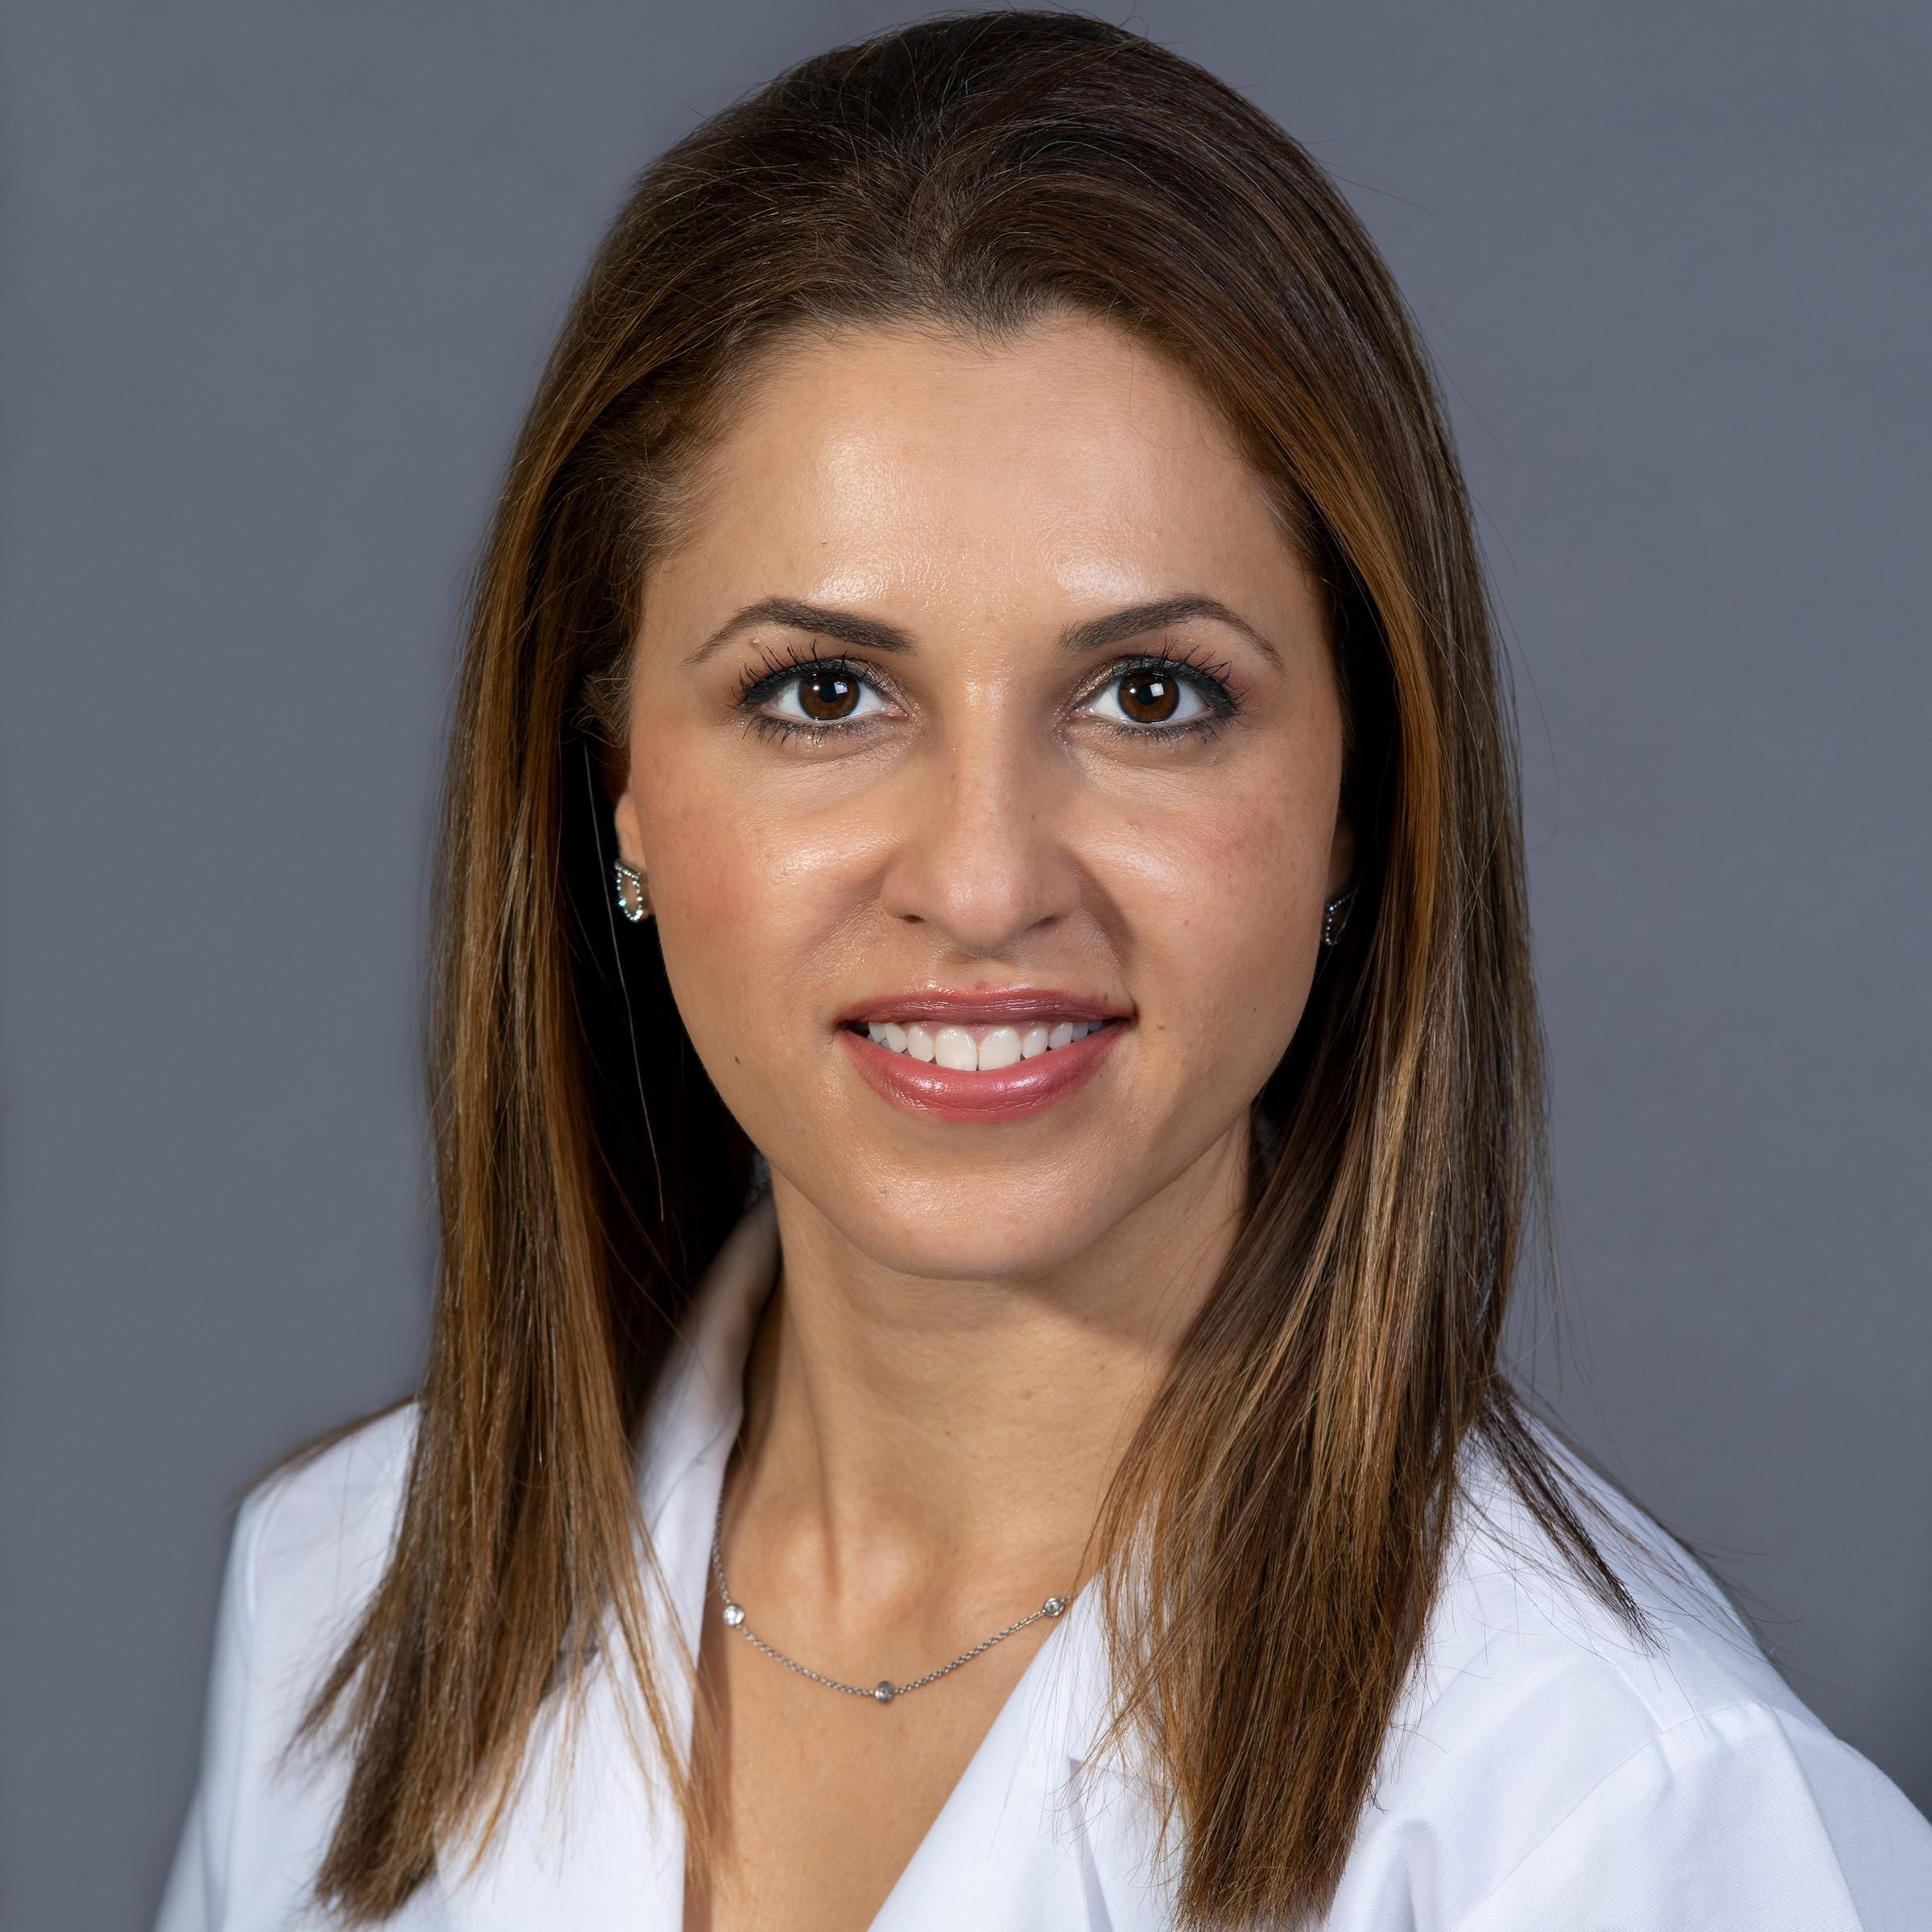 Mahsa Mehrazin